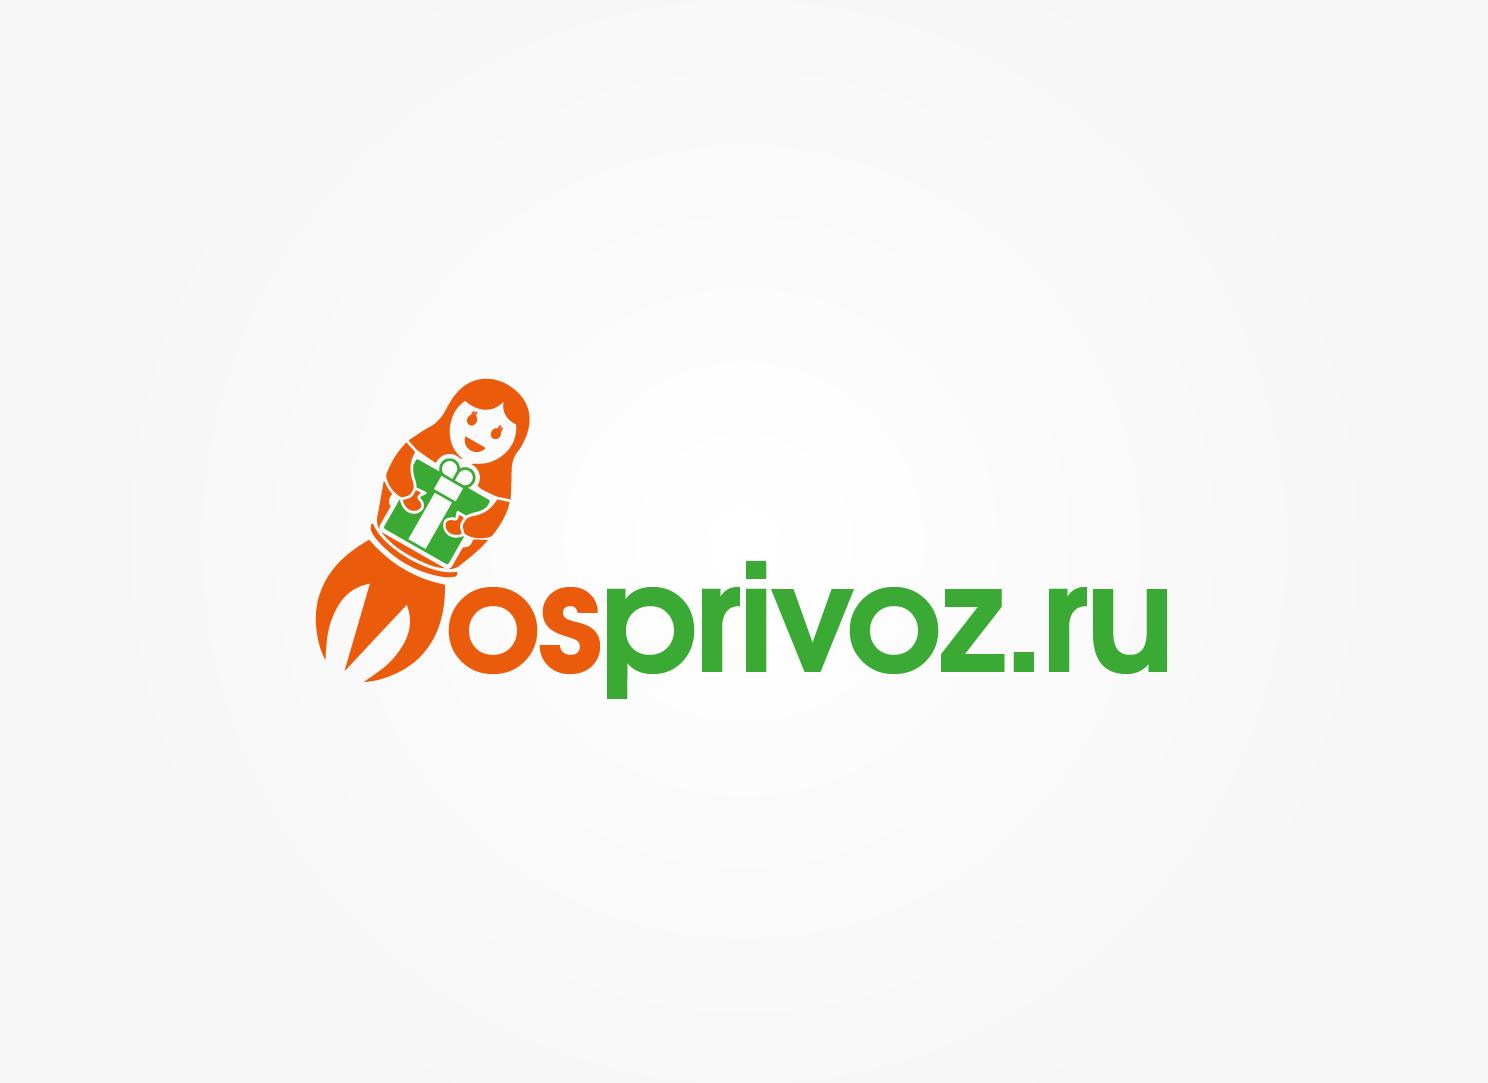 Логотип. Интернет - магазин по доставке продуктов питания. фото f_4775ad4defe2c77f.png